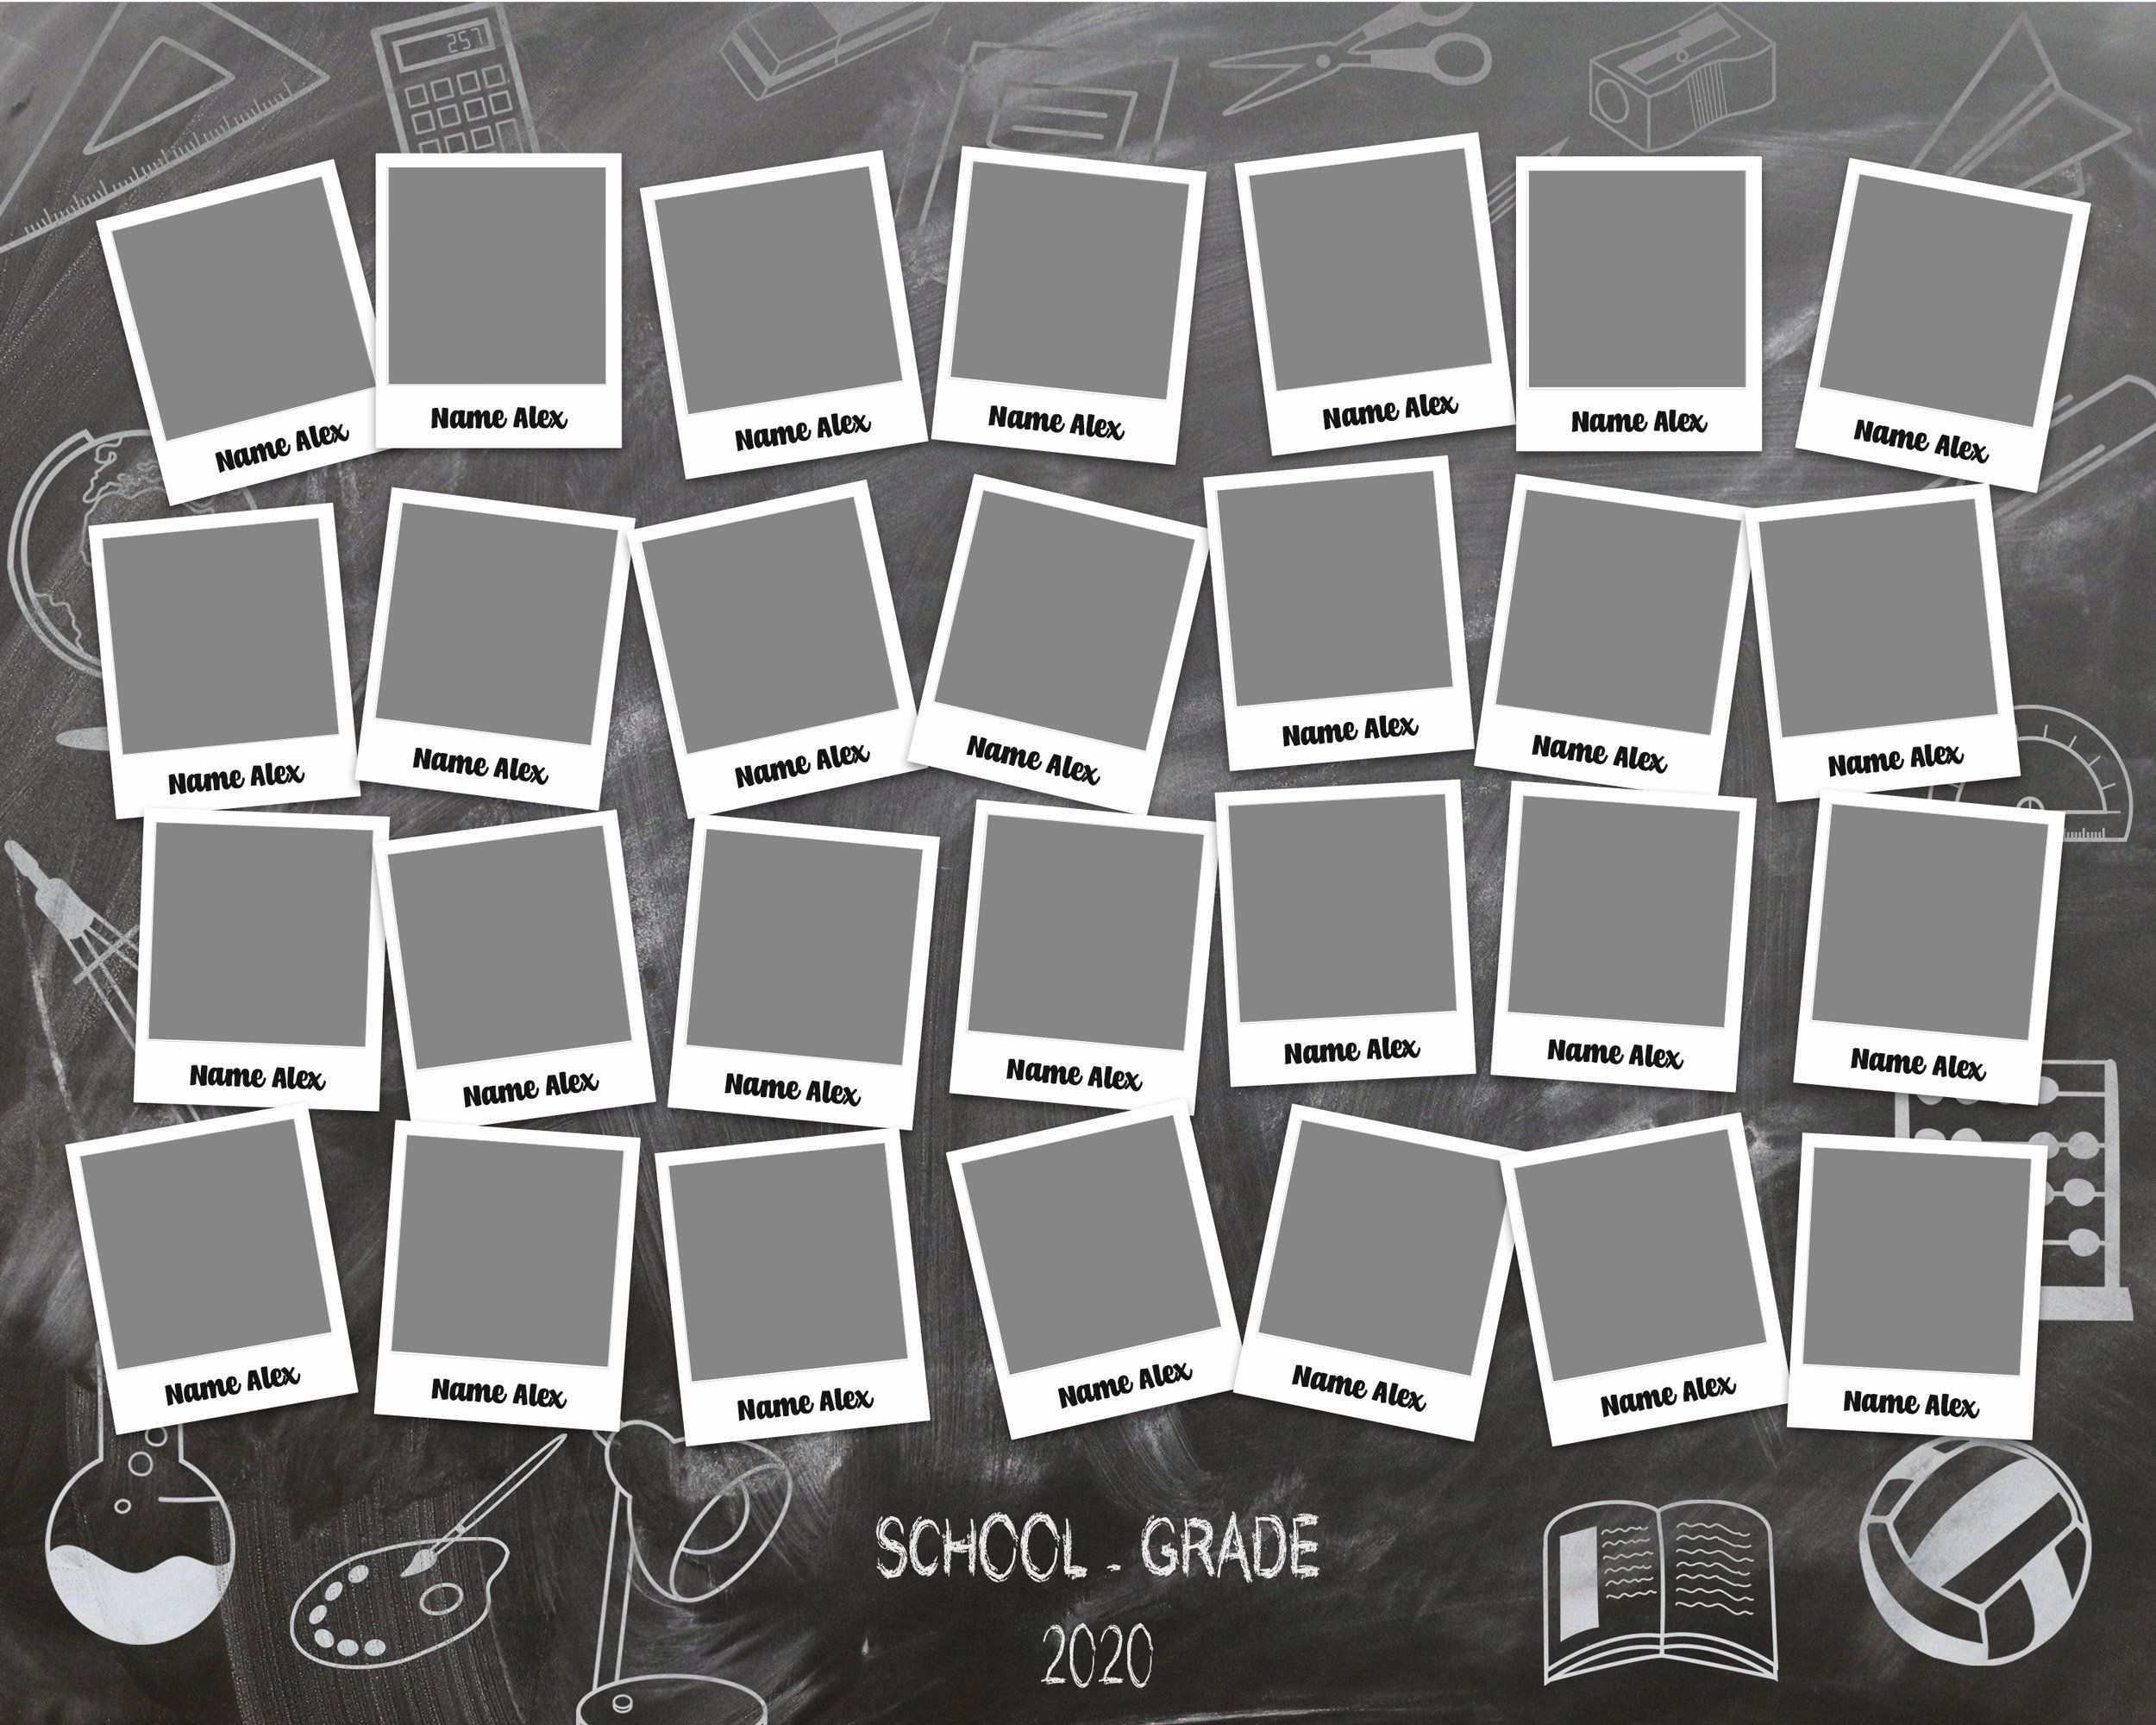 Custom Class Photo Collage Template For School Kindergarten Classroom Layered Psd File Yearbook 8x10 3 2 Instant Download Photo Collage Template Collage Template Photo Collage